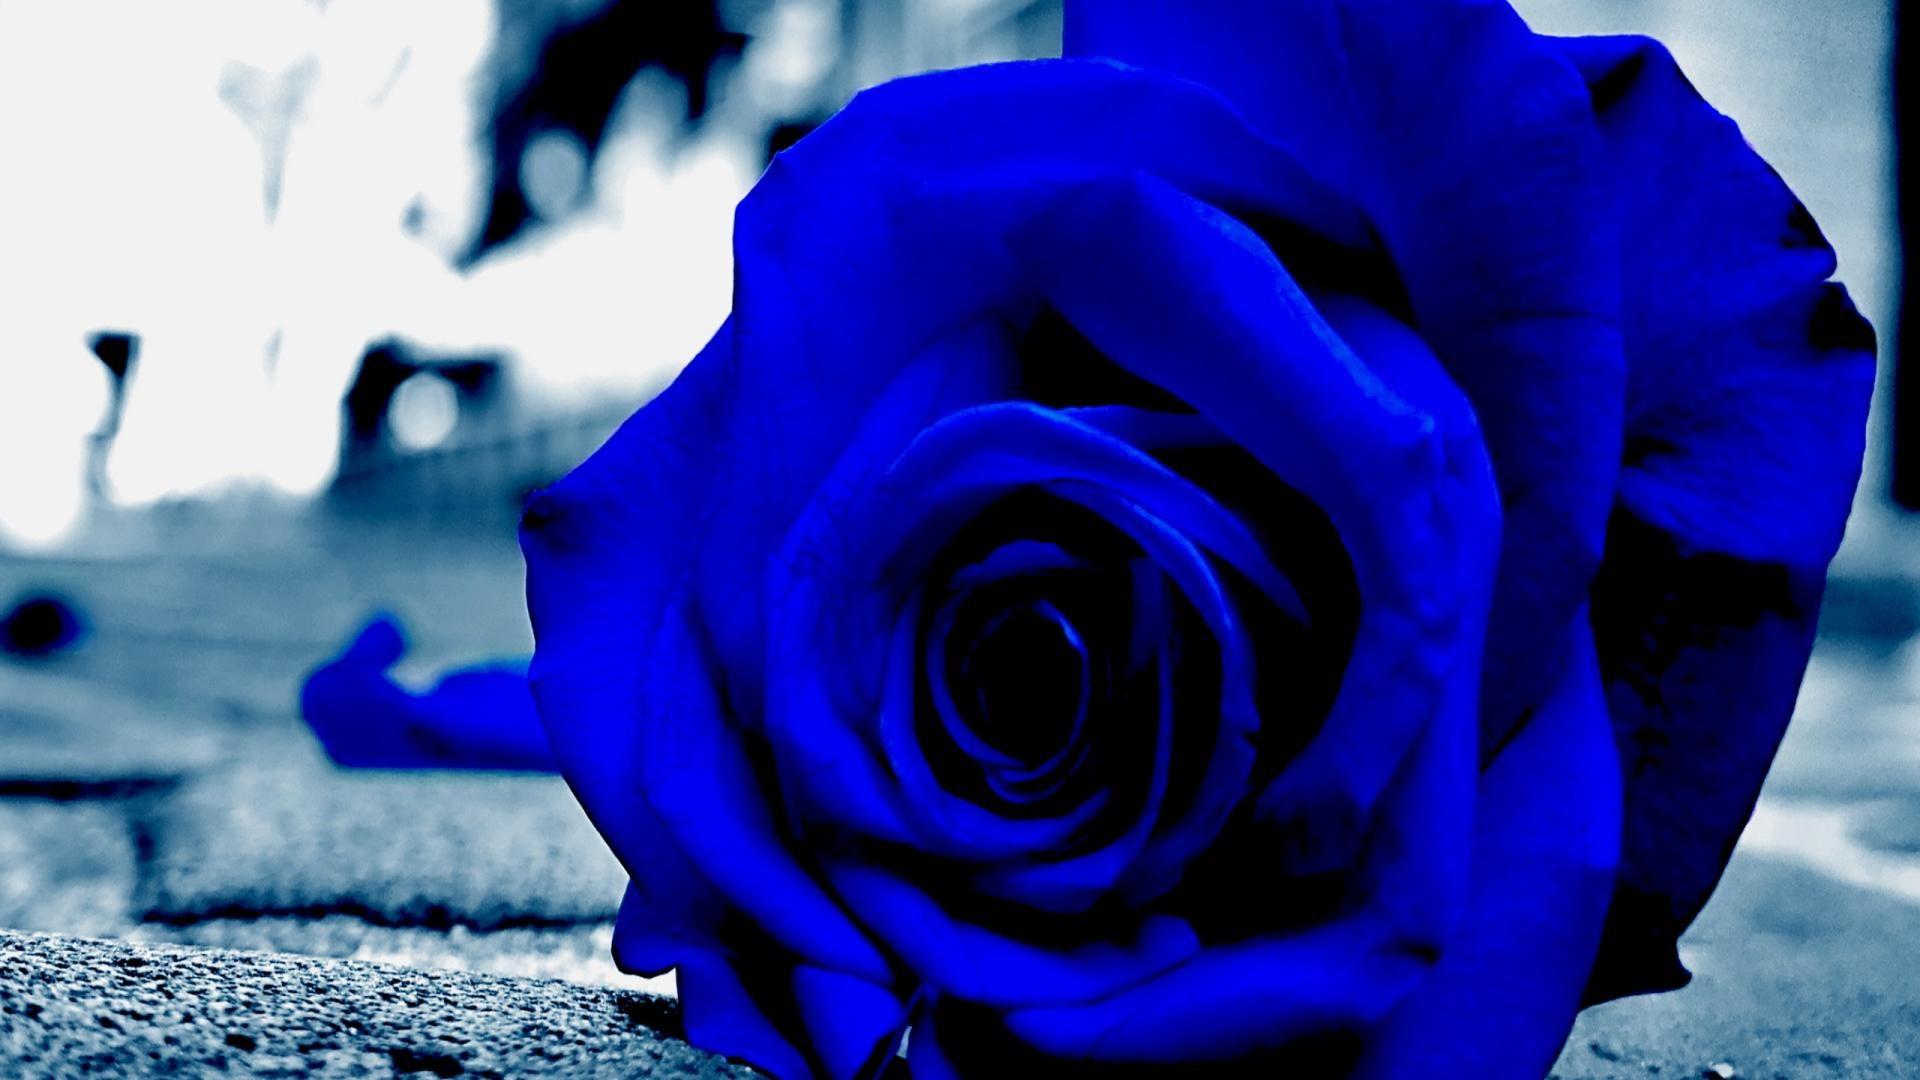 hintergrundbilder einfarbig natur pflanzen fotografie lila blau blaue rose farbe blume. Black Bedroom Furniture Sets. Home Design Ideas